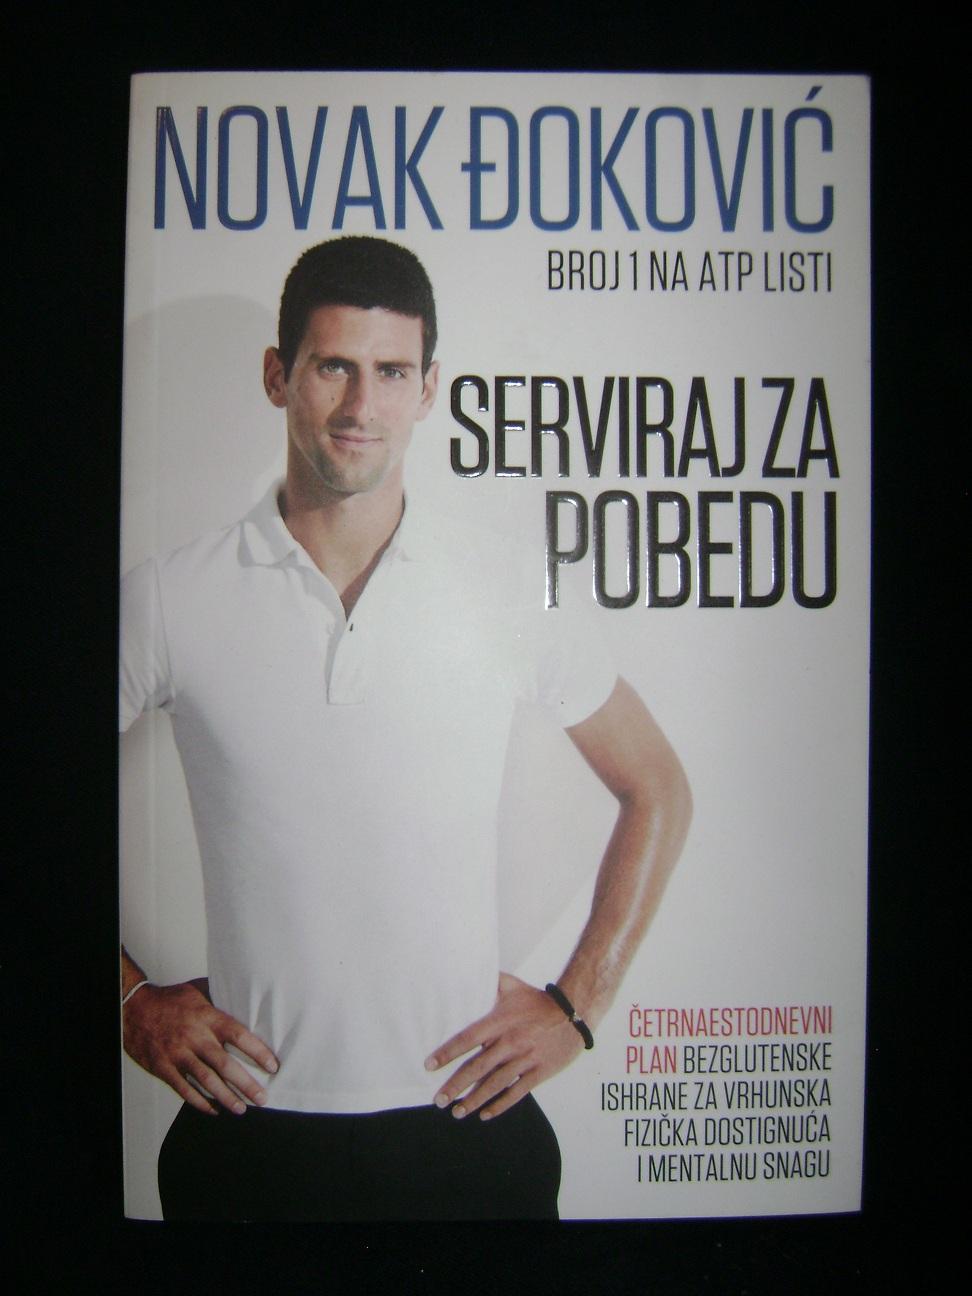 SERVIRAJ_ZA_POBEDU_Novak_Đoković.JPG